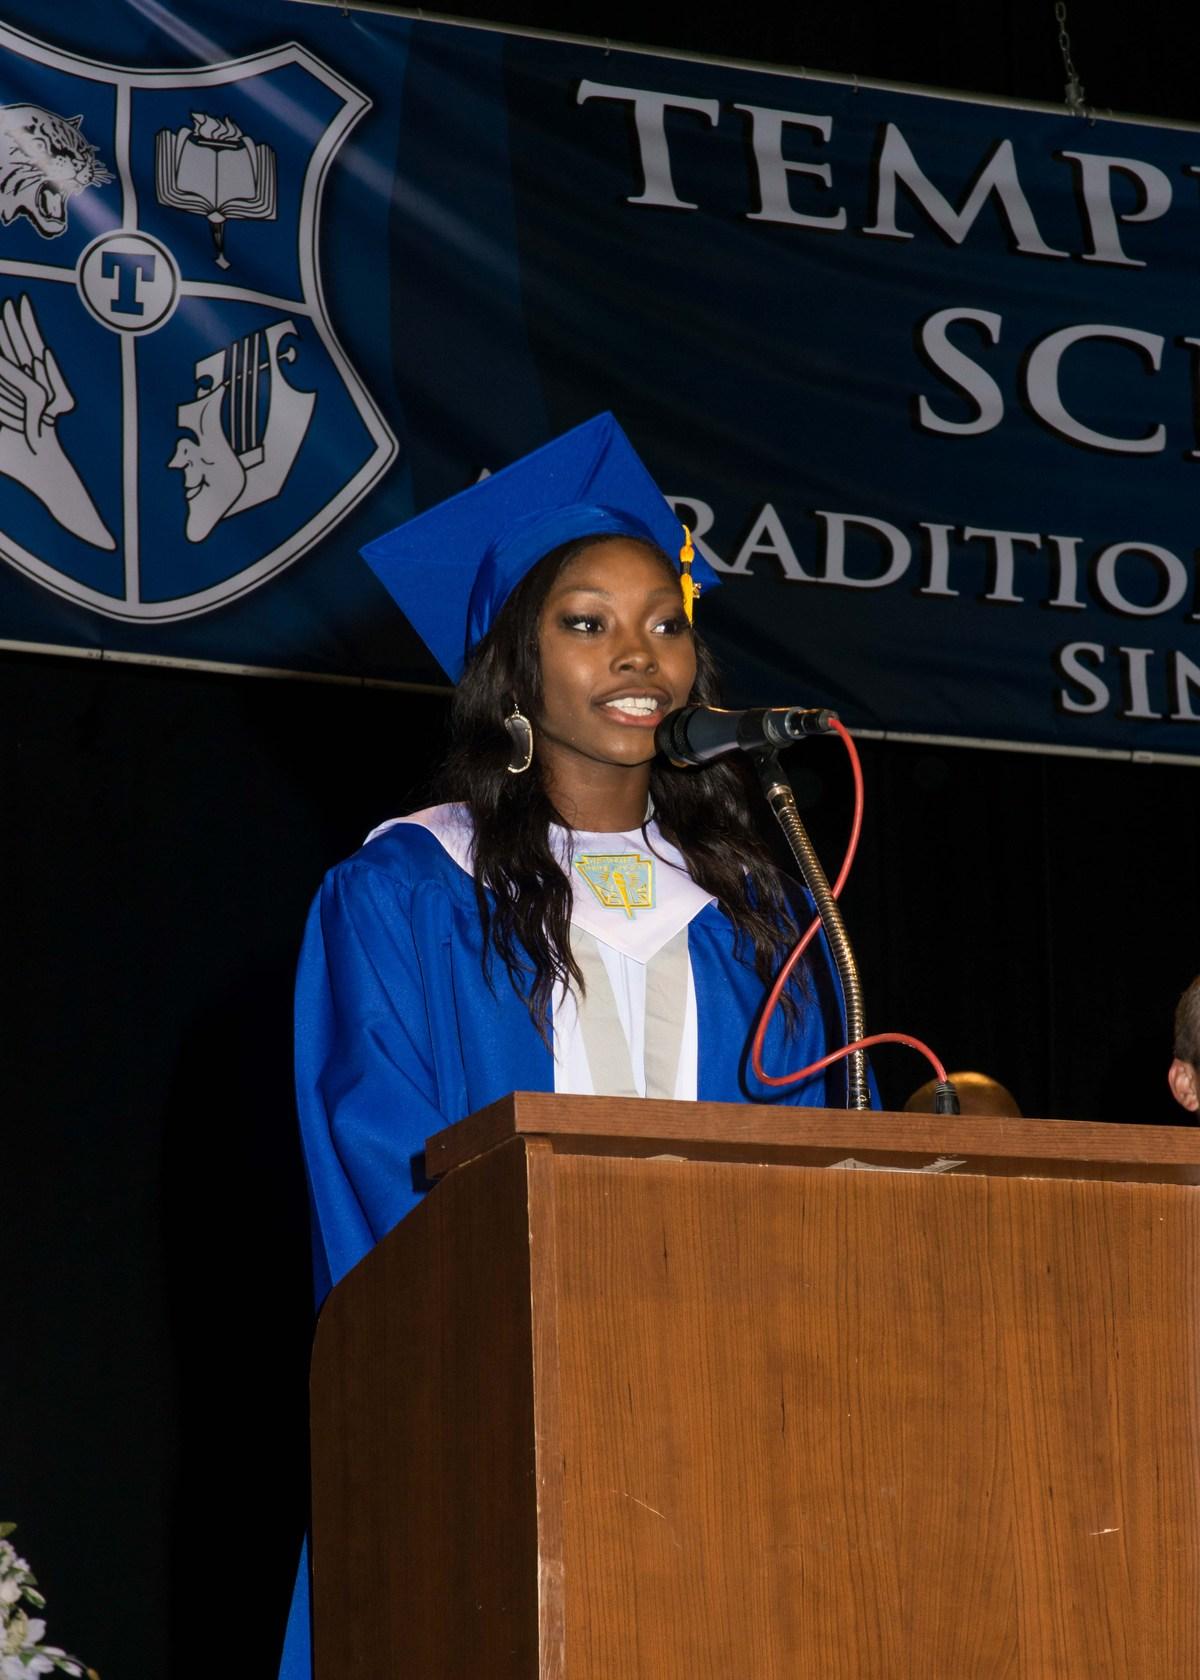 Temple Graduation 2020.Commencement Photos Class Of 2020 Temple High School